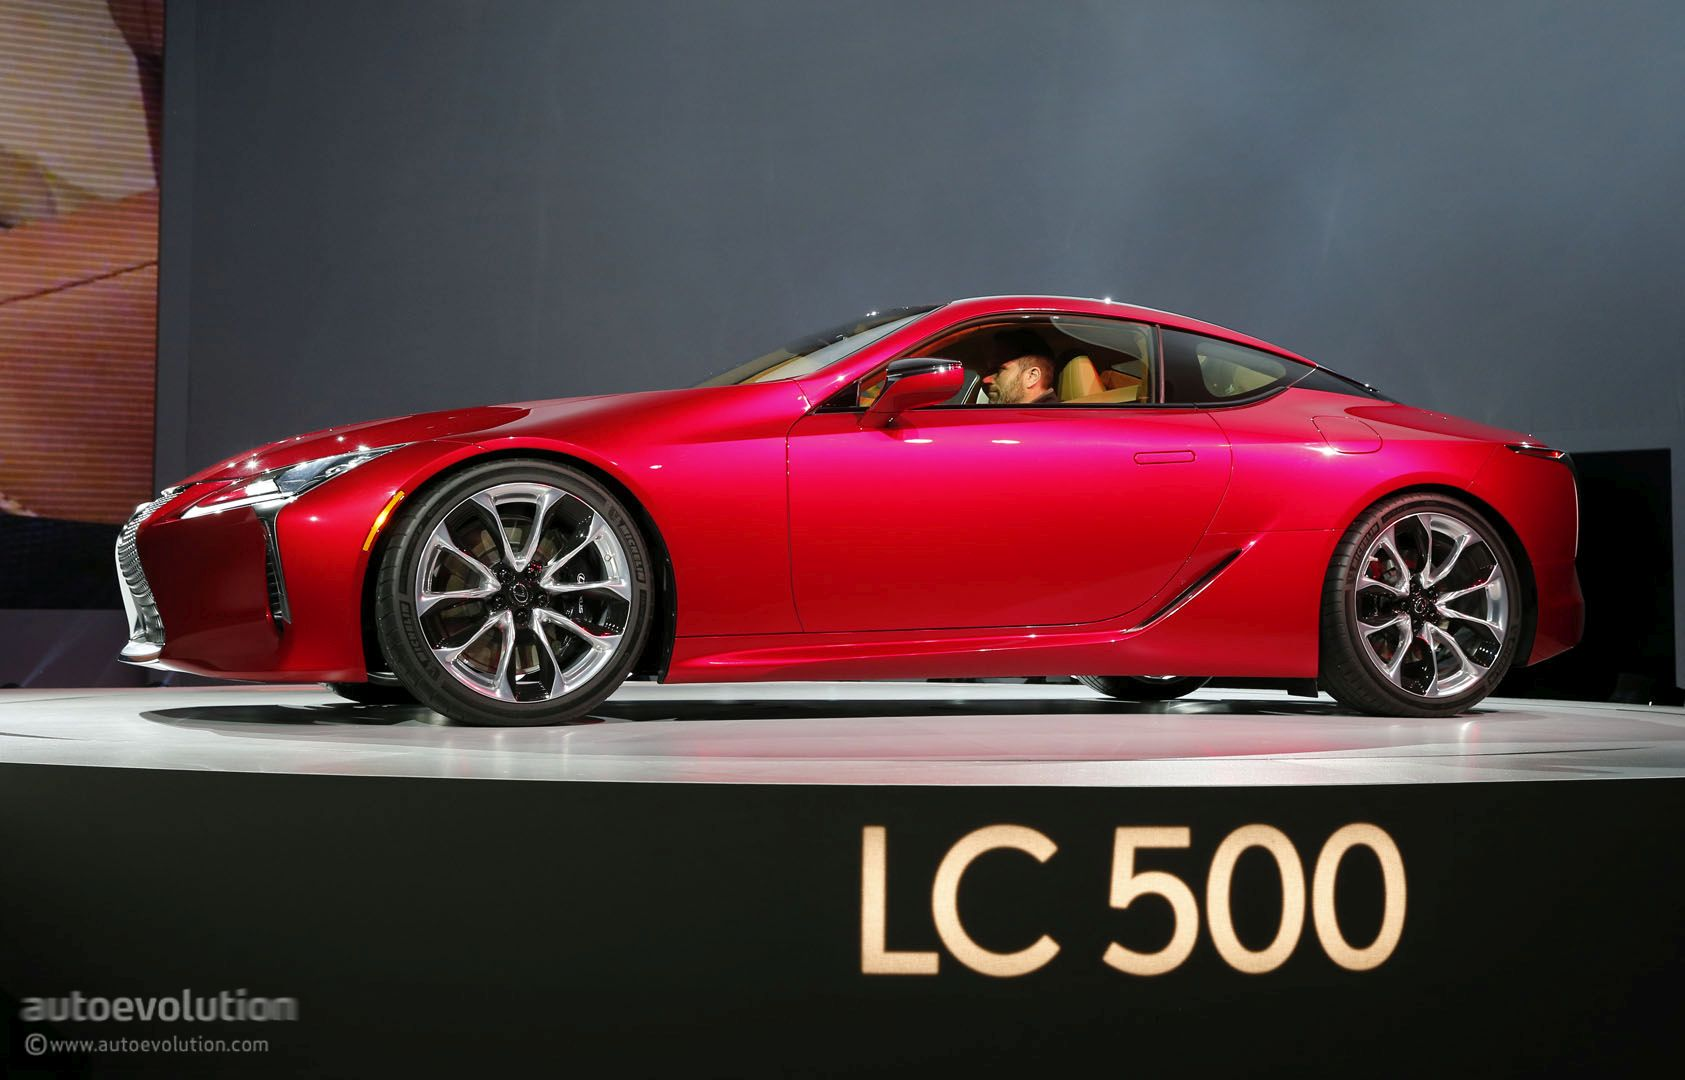 Funky Lexus Lc 500 Receives 2016 Eyeson Design Awards